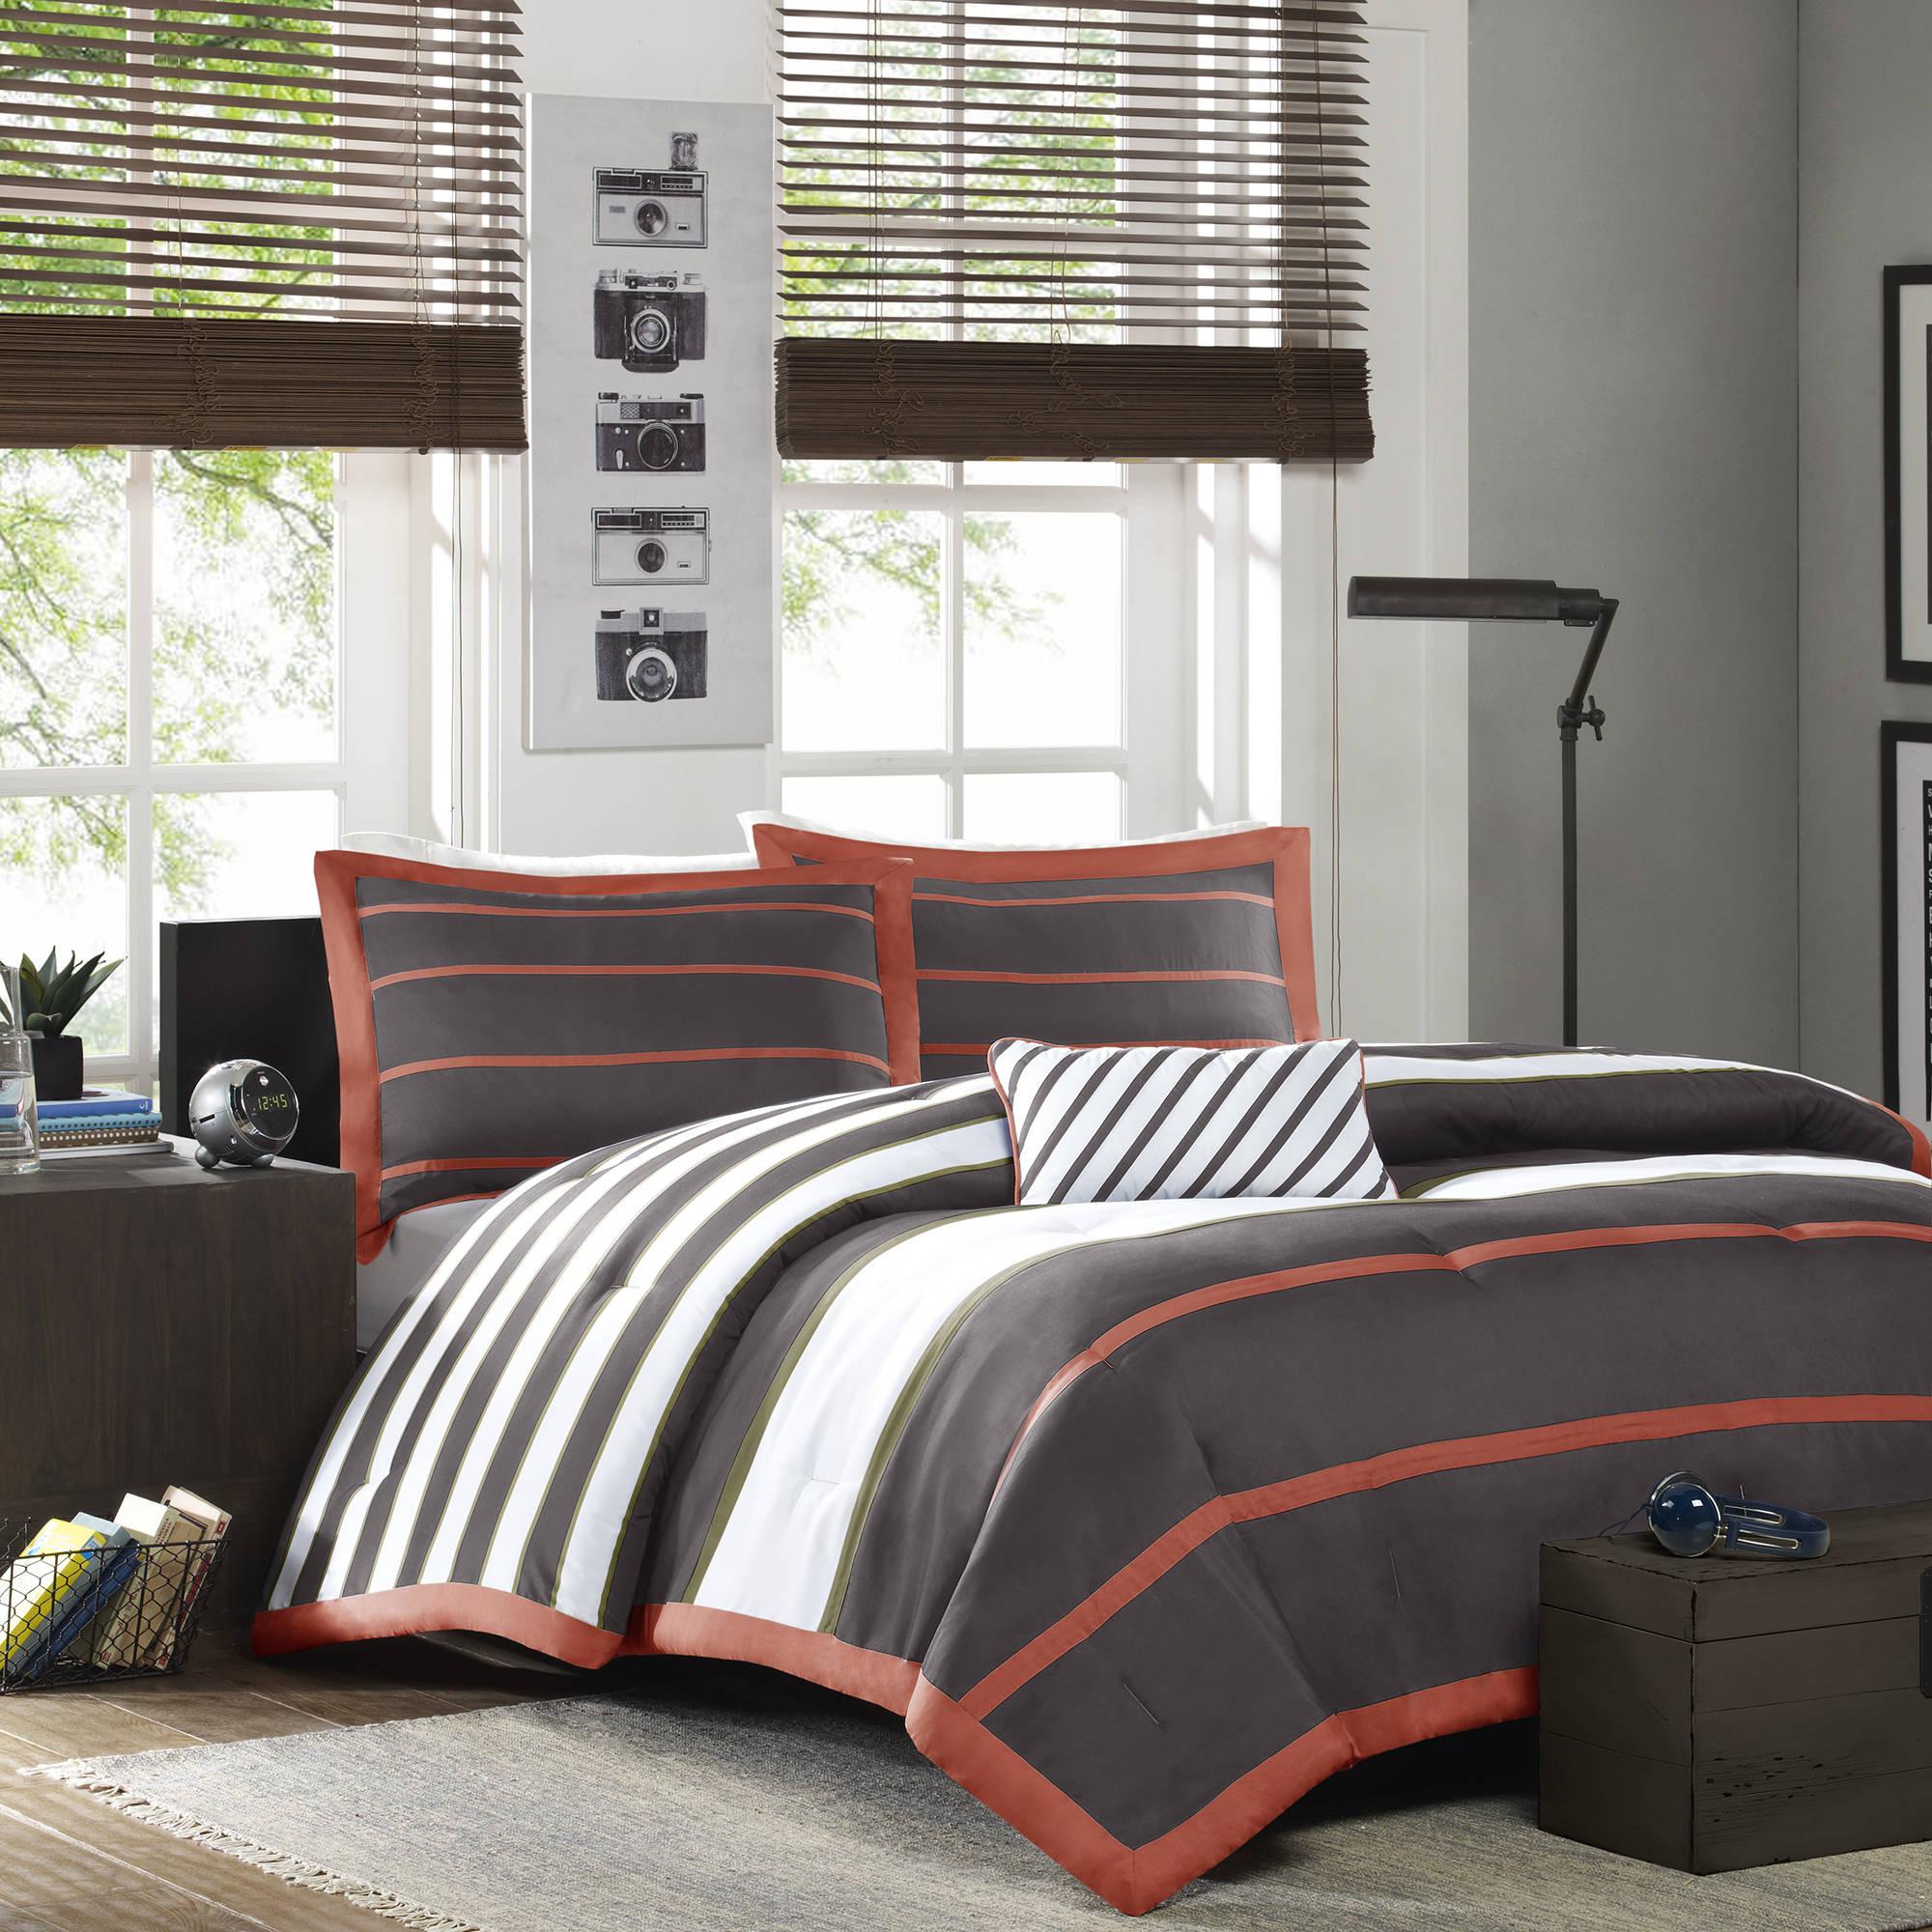 Home Essence Apartment Cody Bedding Comforter Set